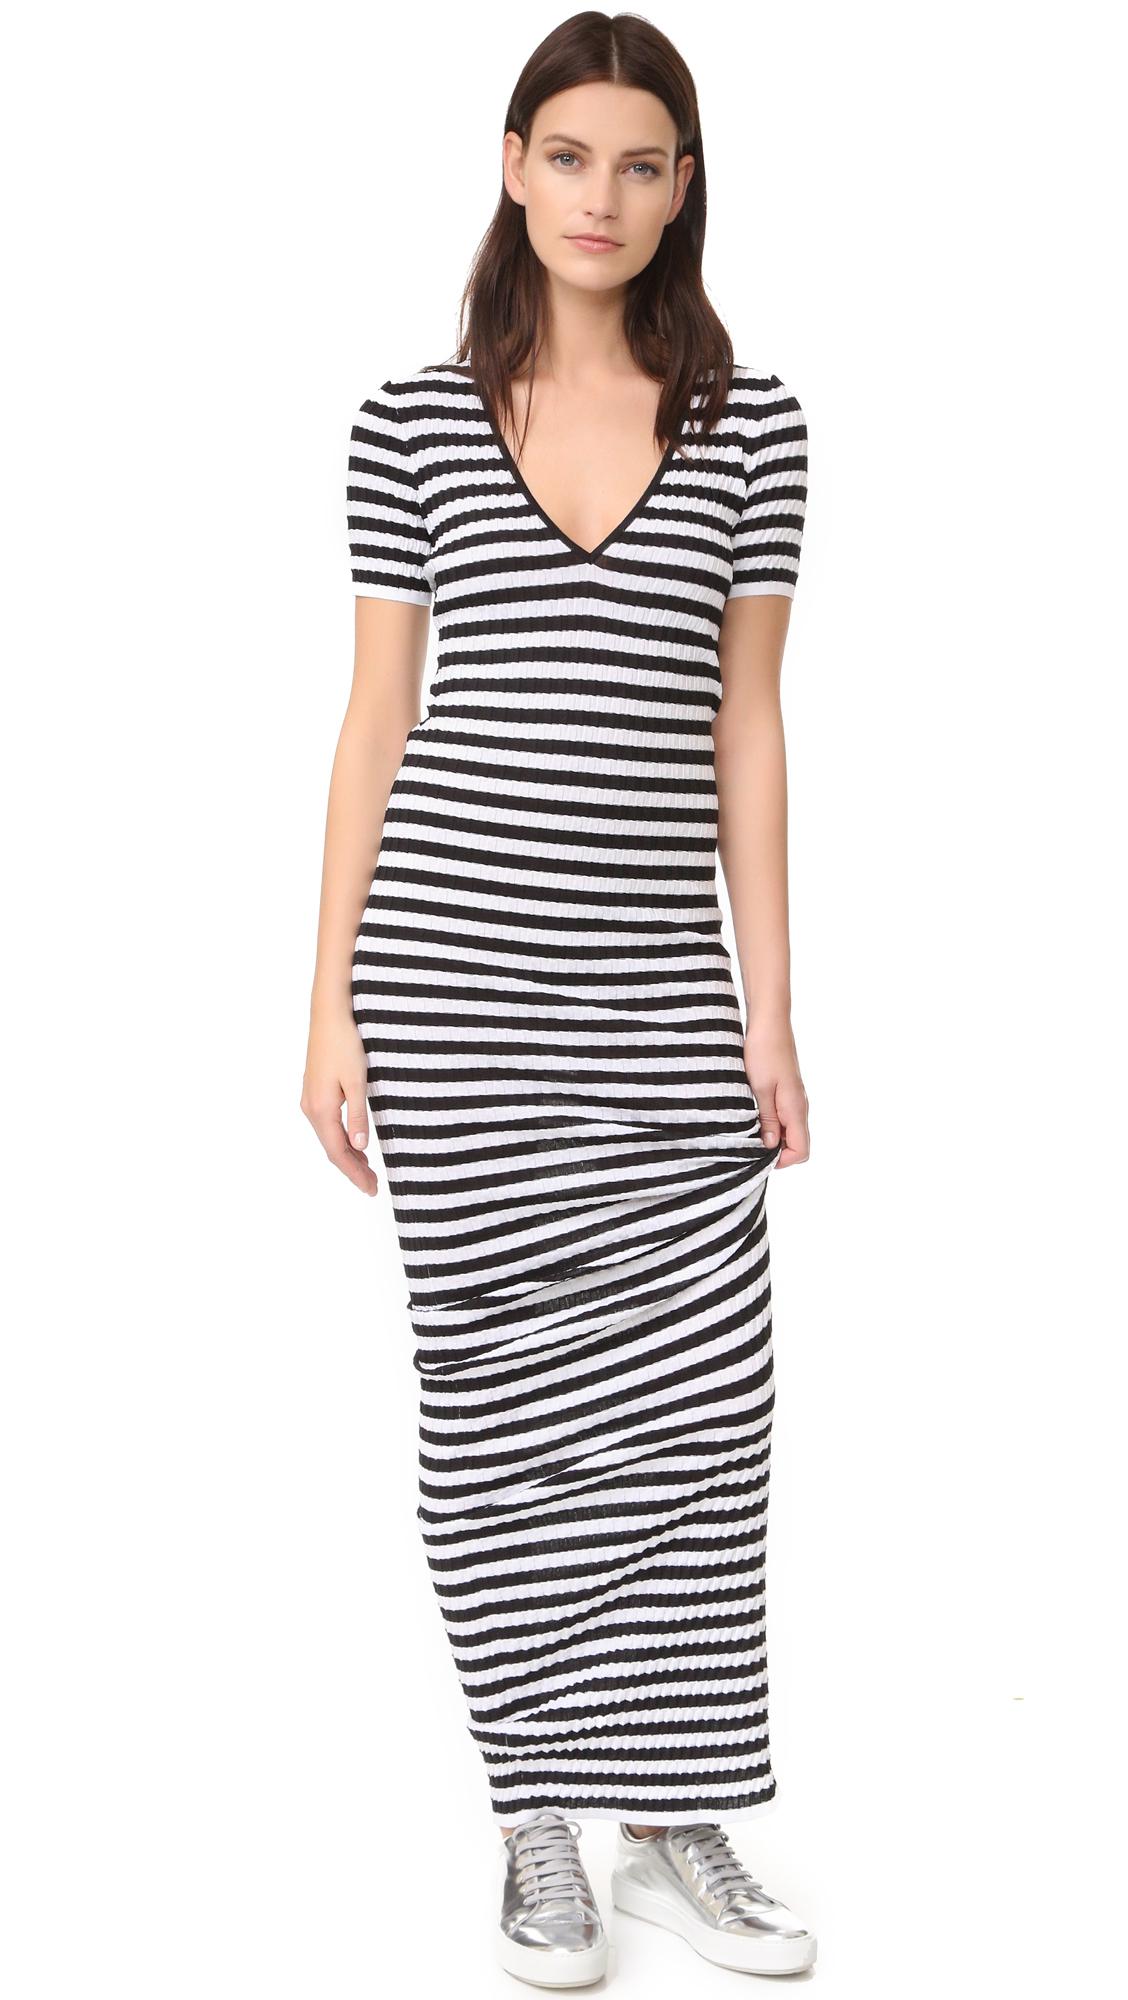 DSQUARED2 Striped Maxi Dress - Black/White